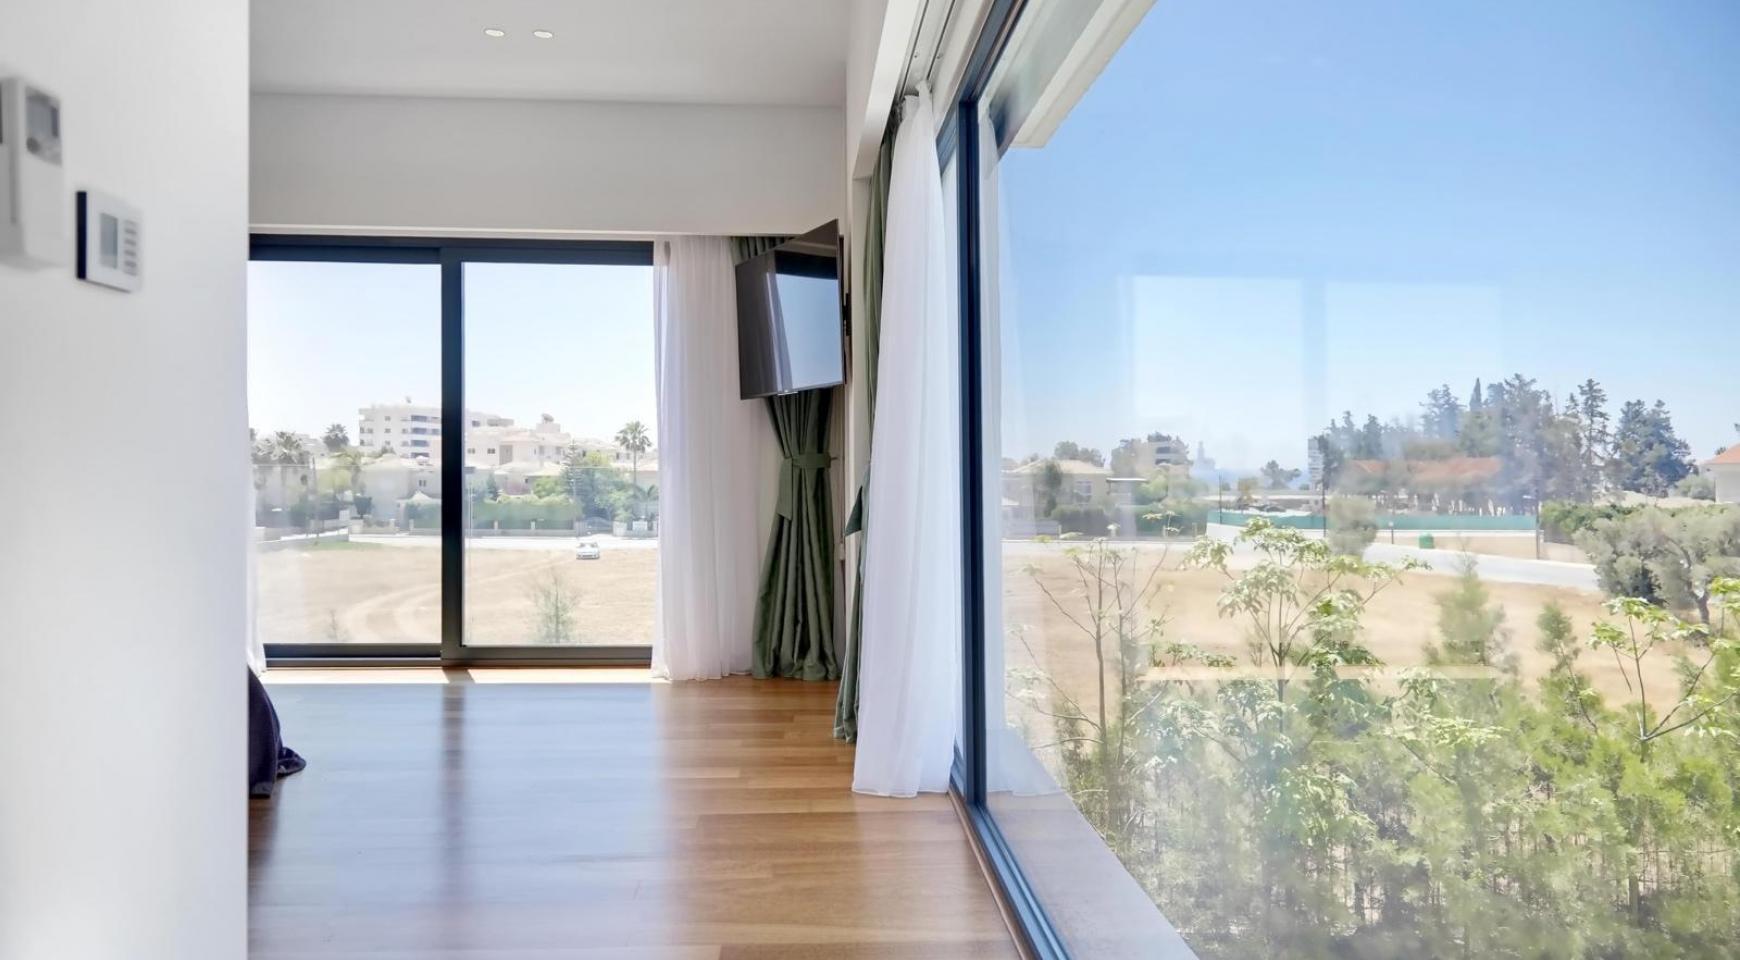 New Luxurious 4 Bedroom Villa in the Tourist Area - 31